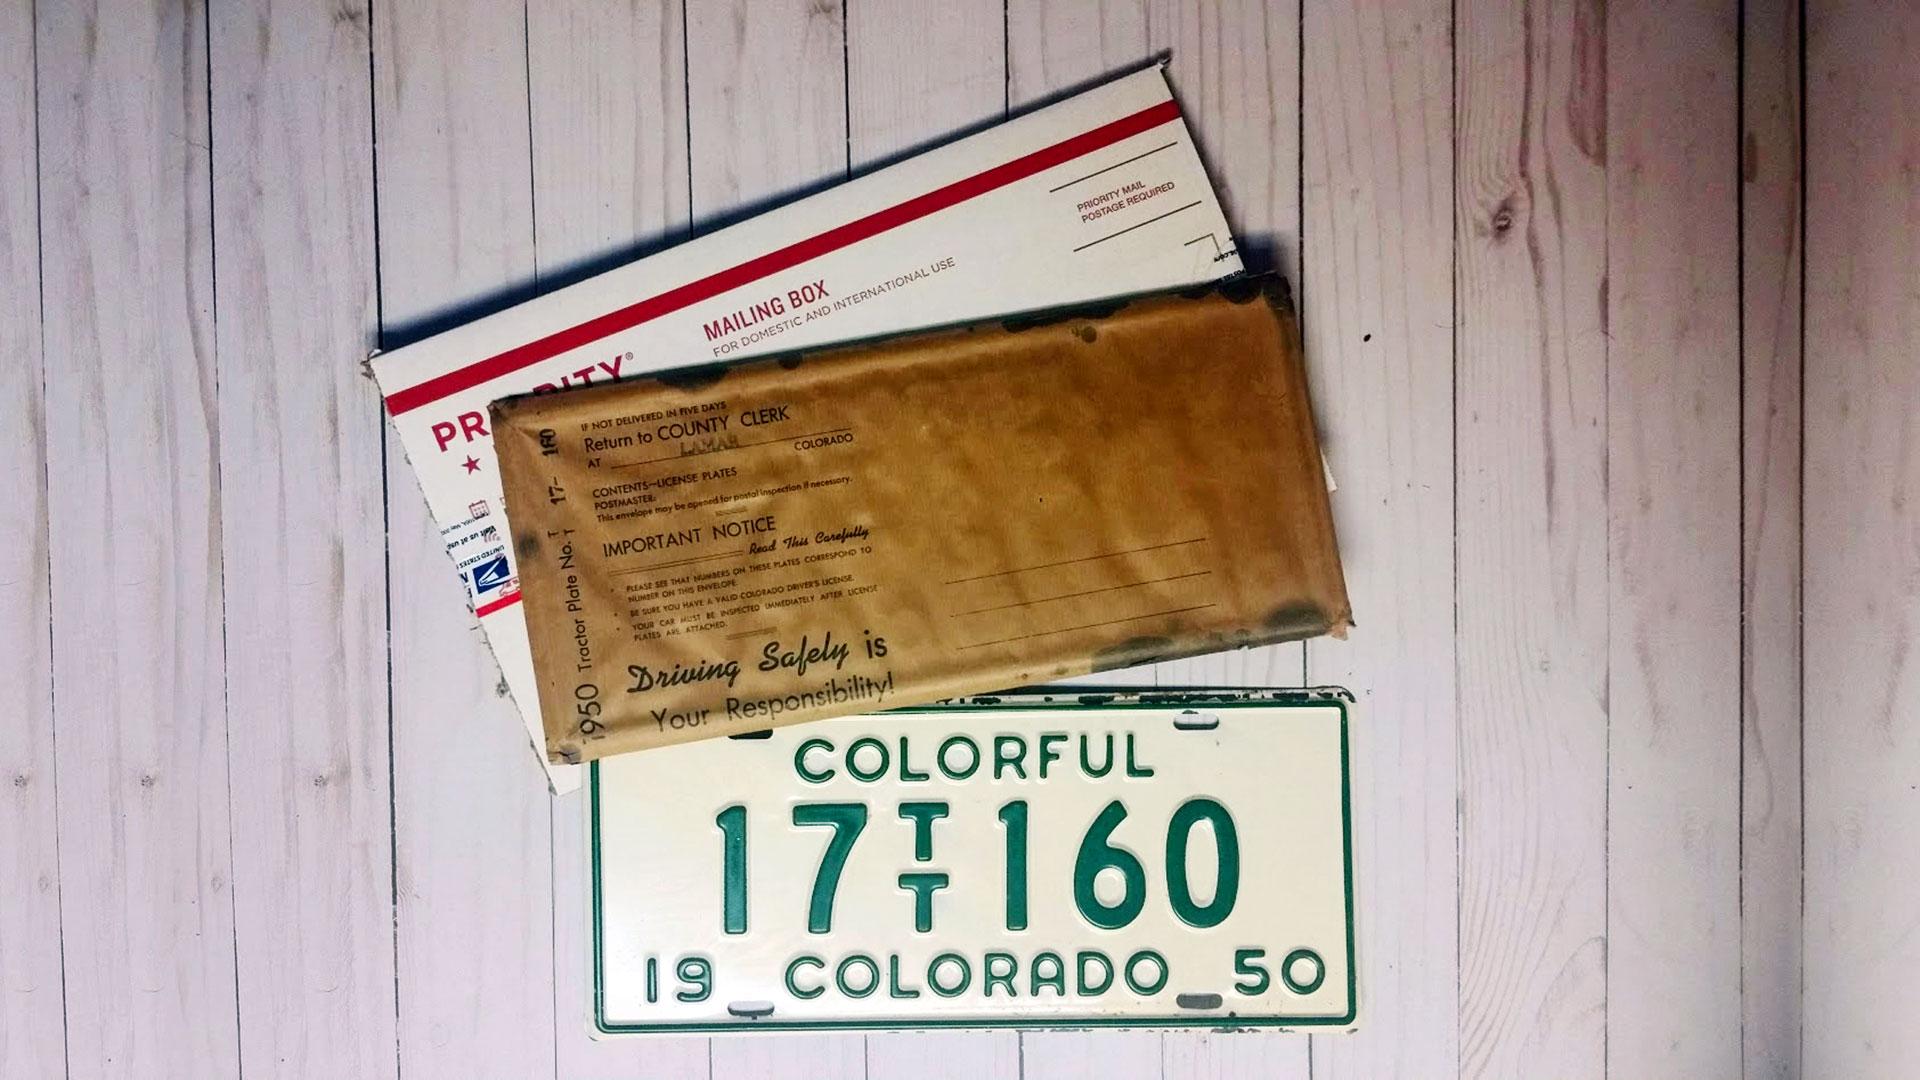 Colorful-Colorado-TT-1950-License-Plates